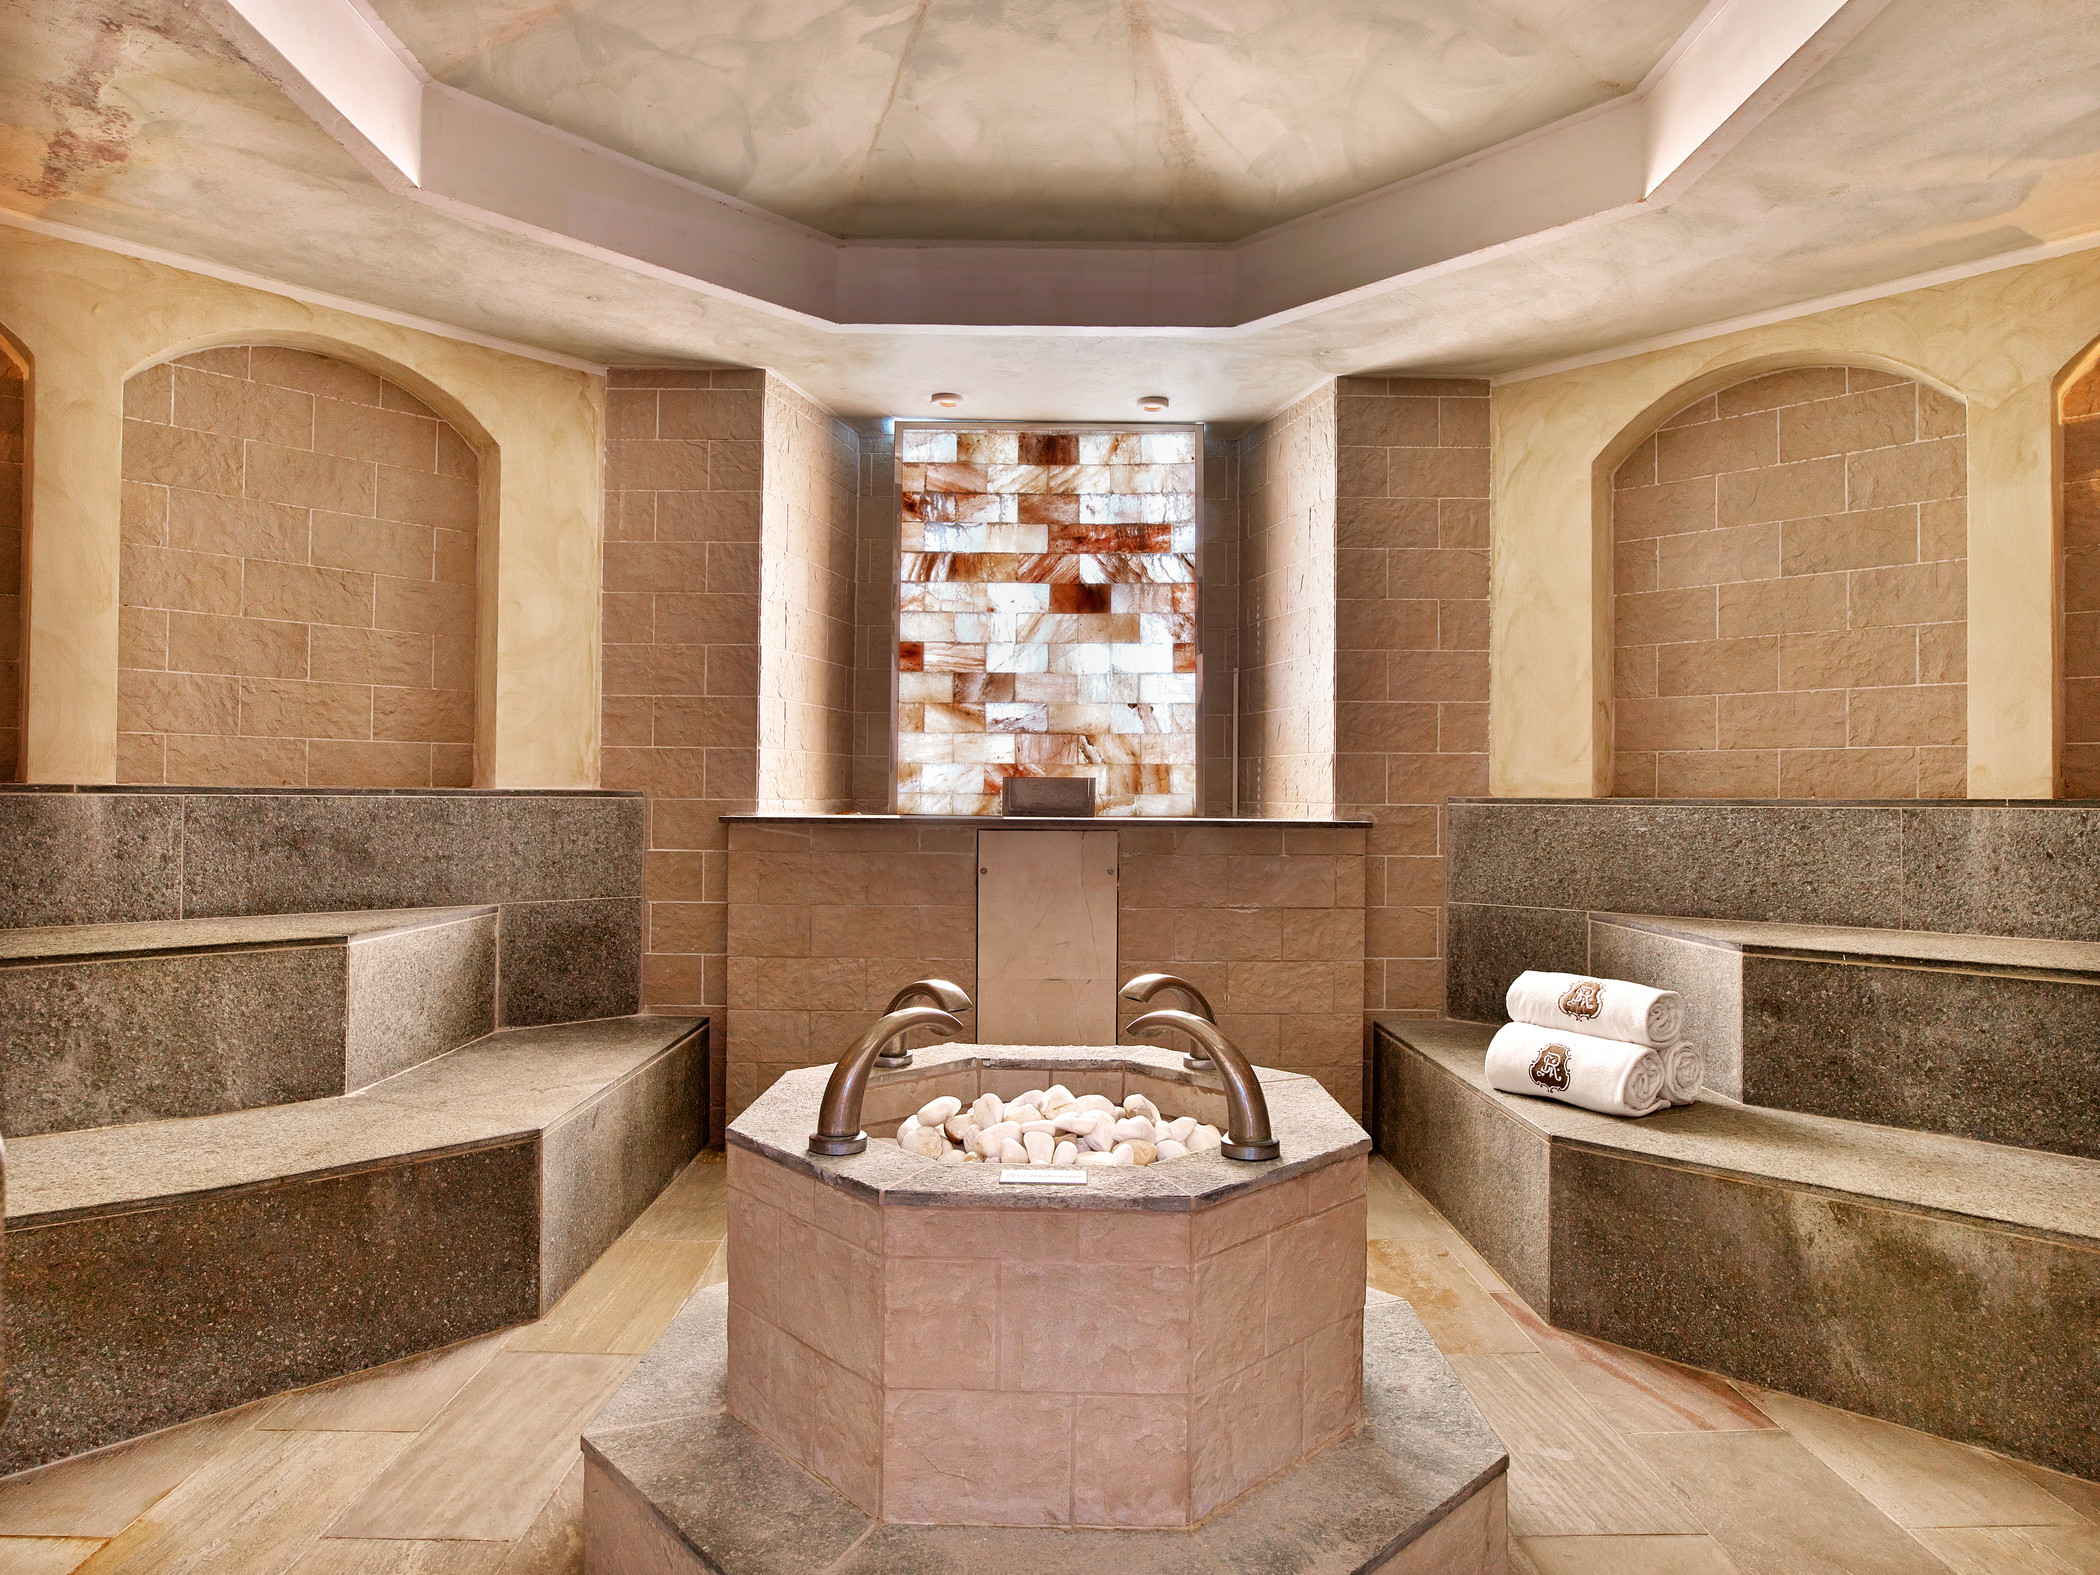 Sauna | St.Regis Mardavall